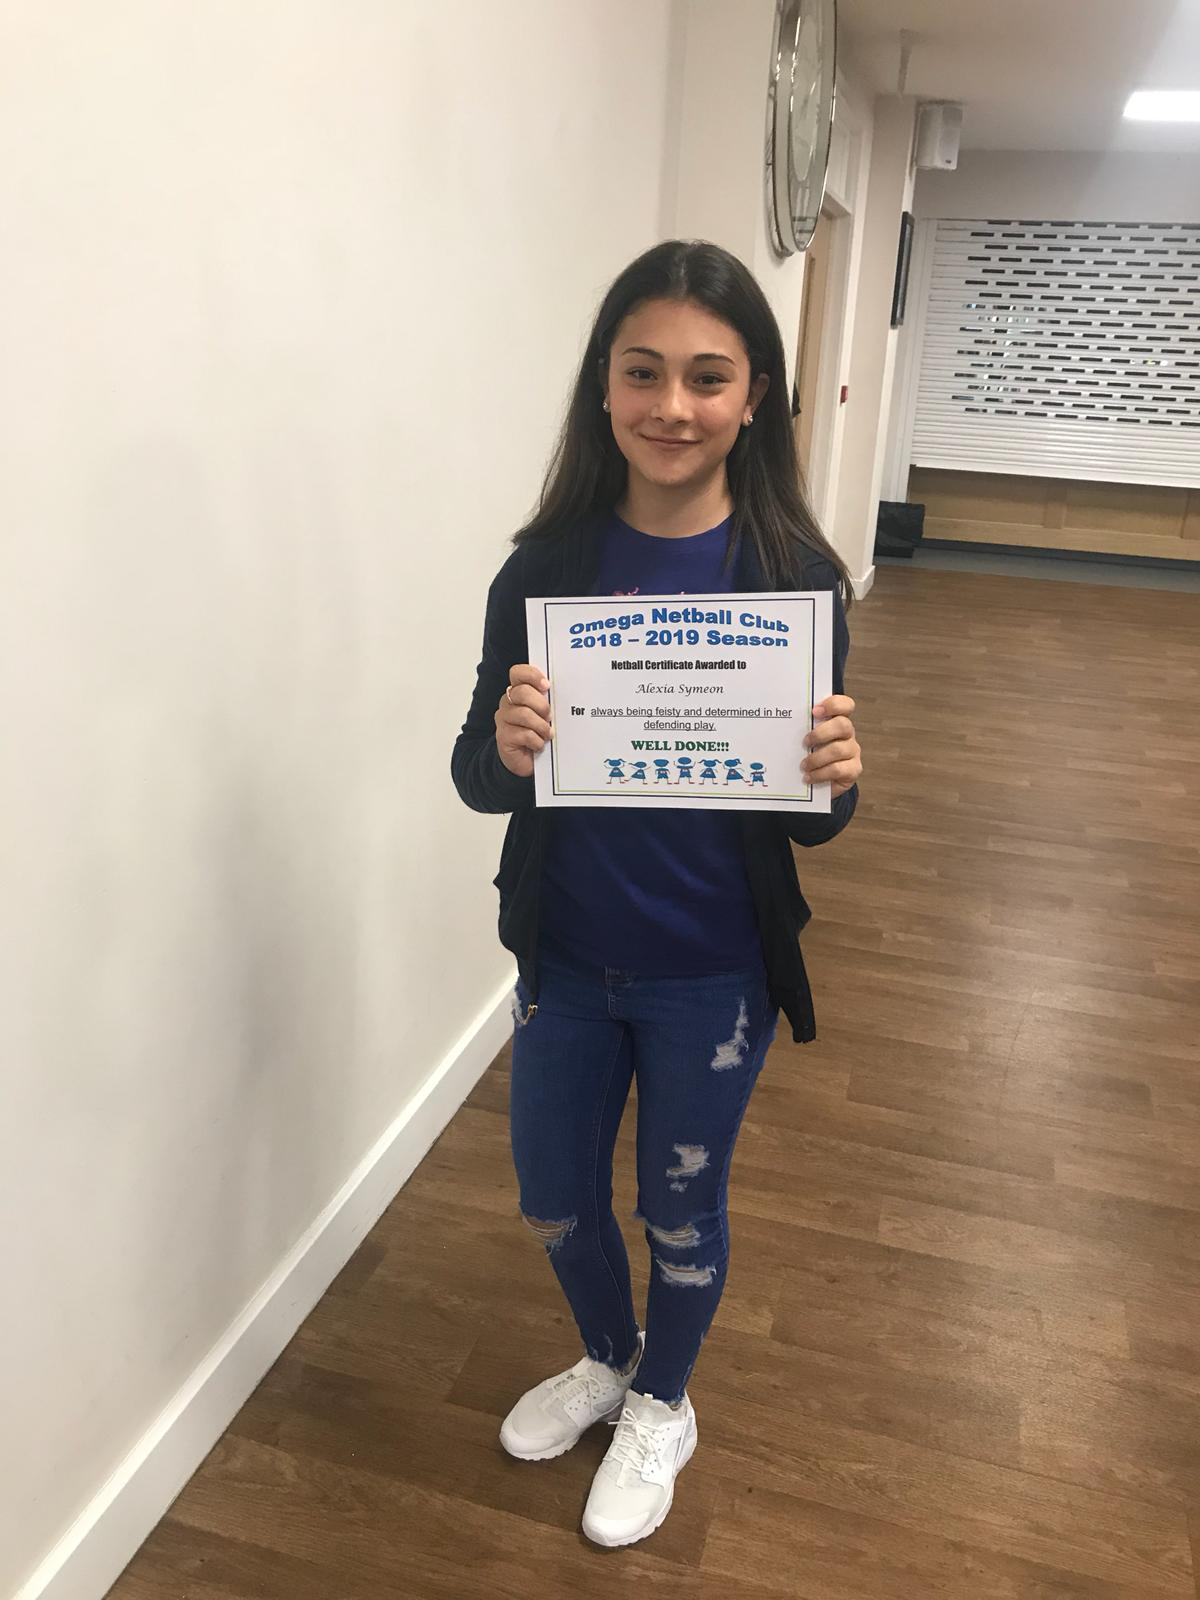 Certificate of achievement for Alexia Symeon